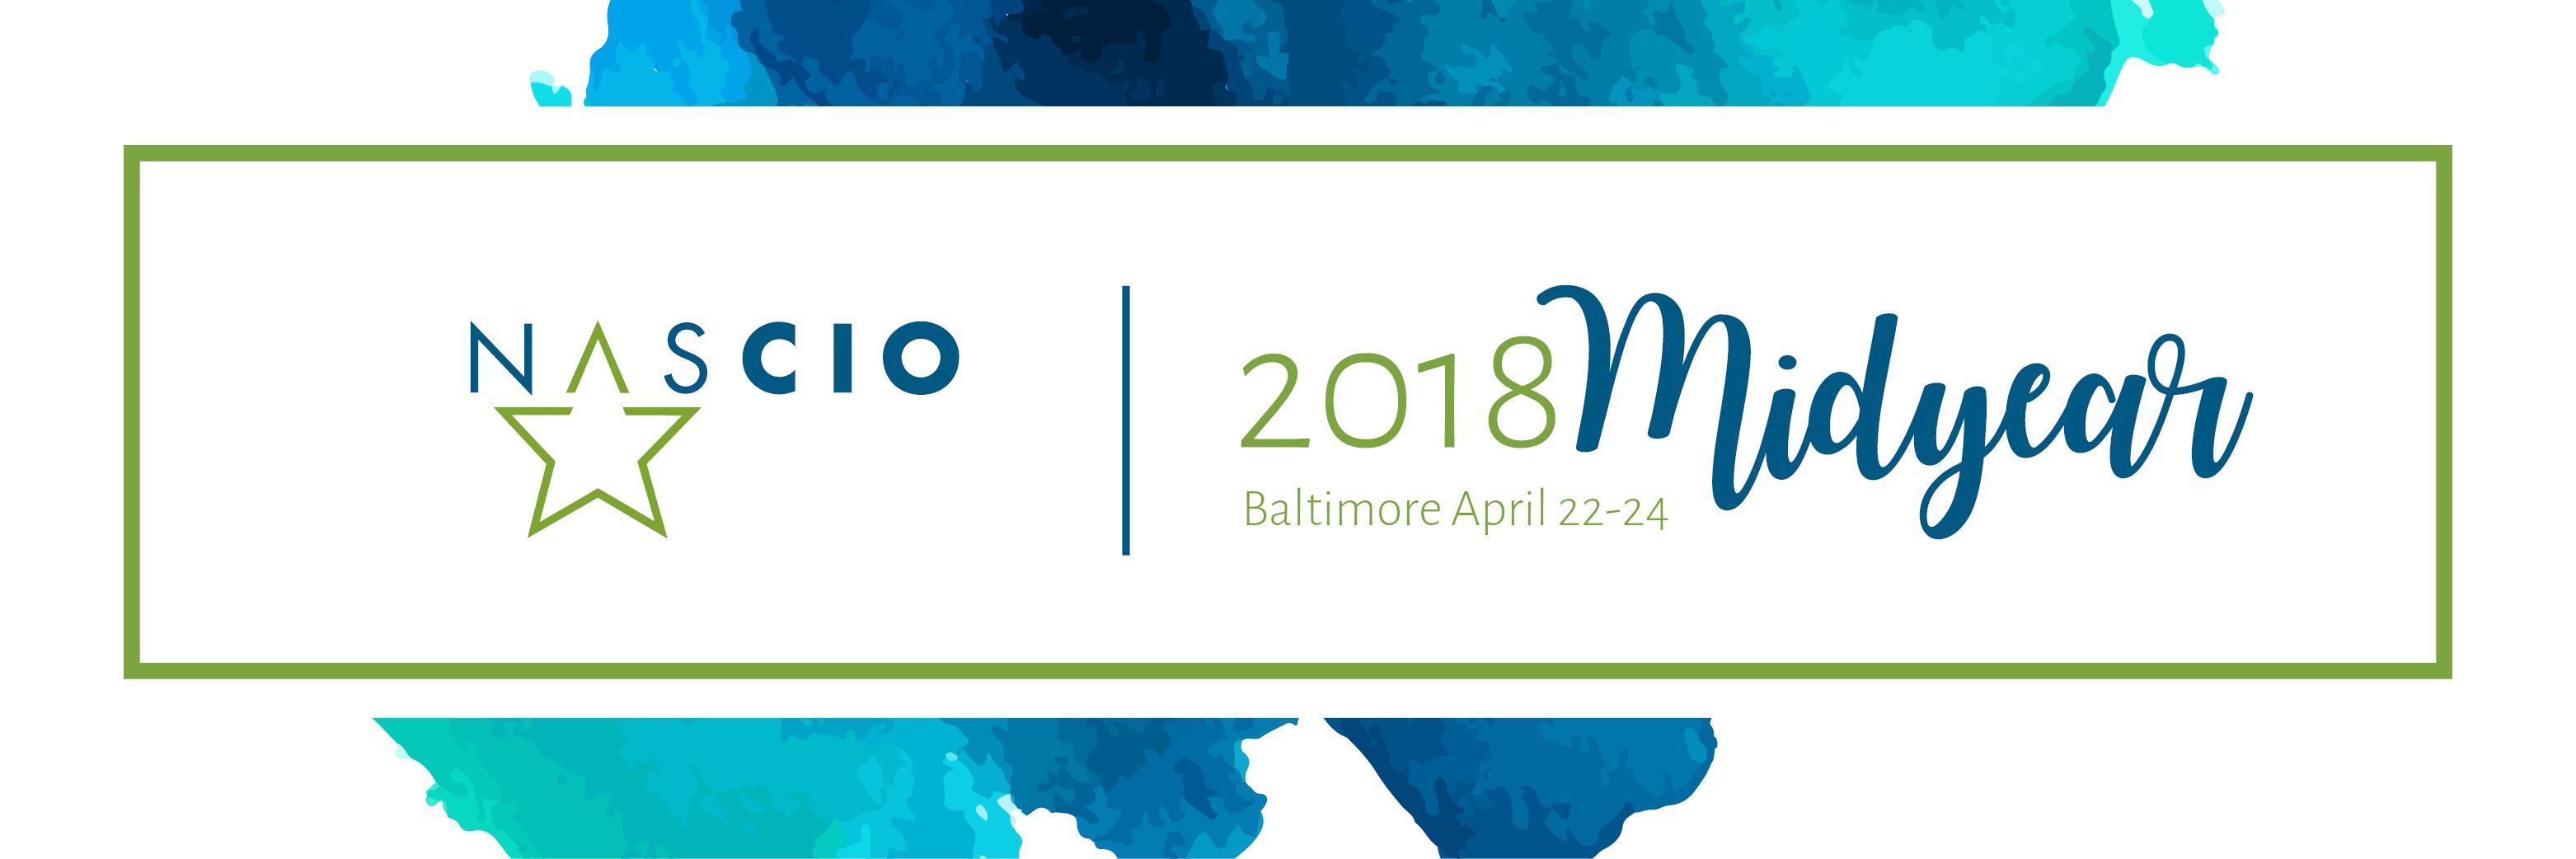 NASCIO 2018 Midyear Conference